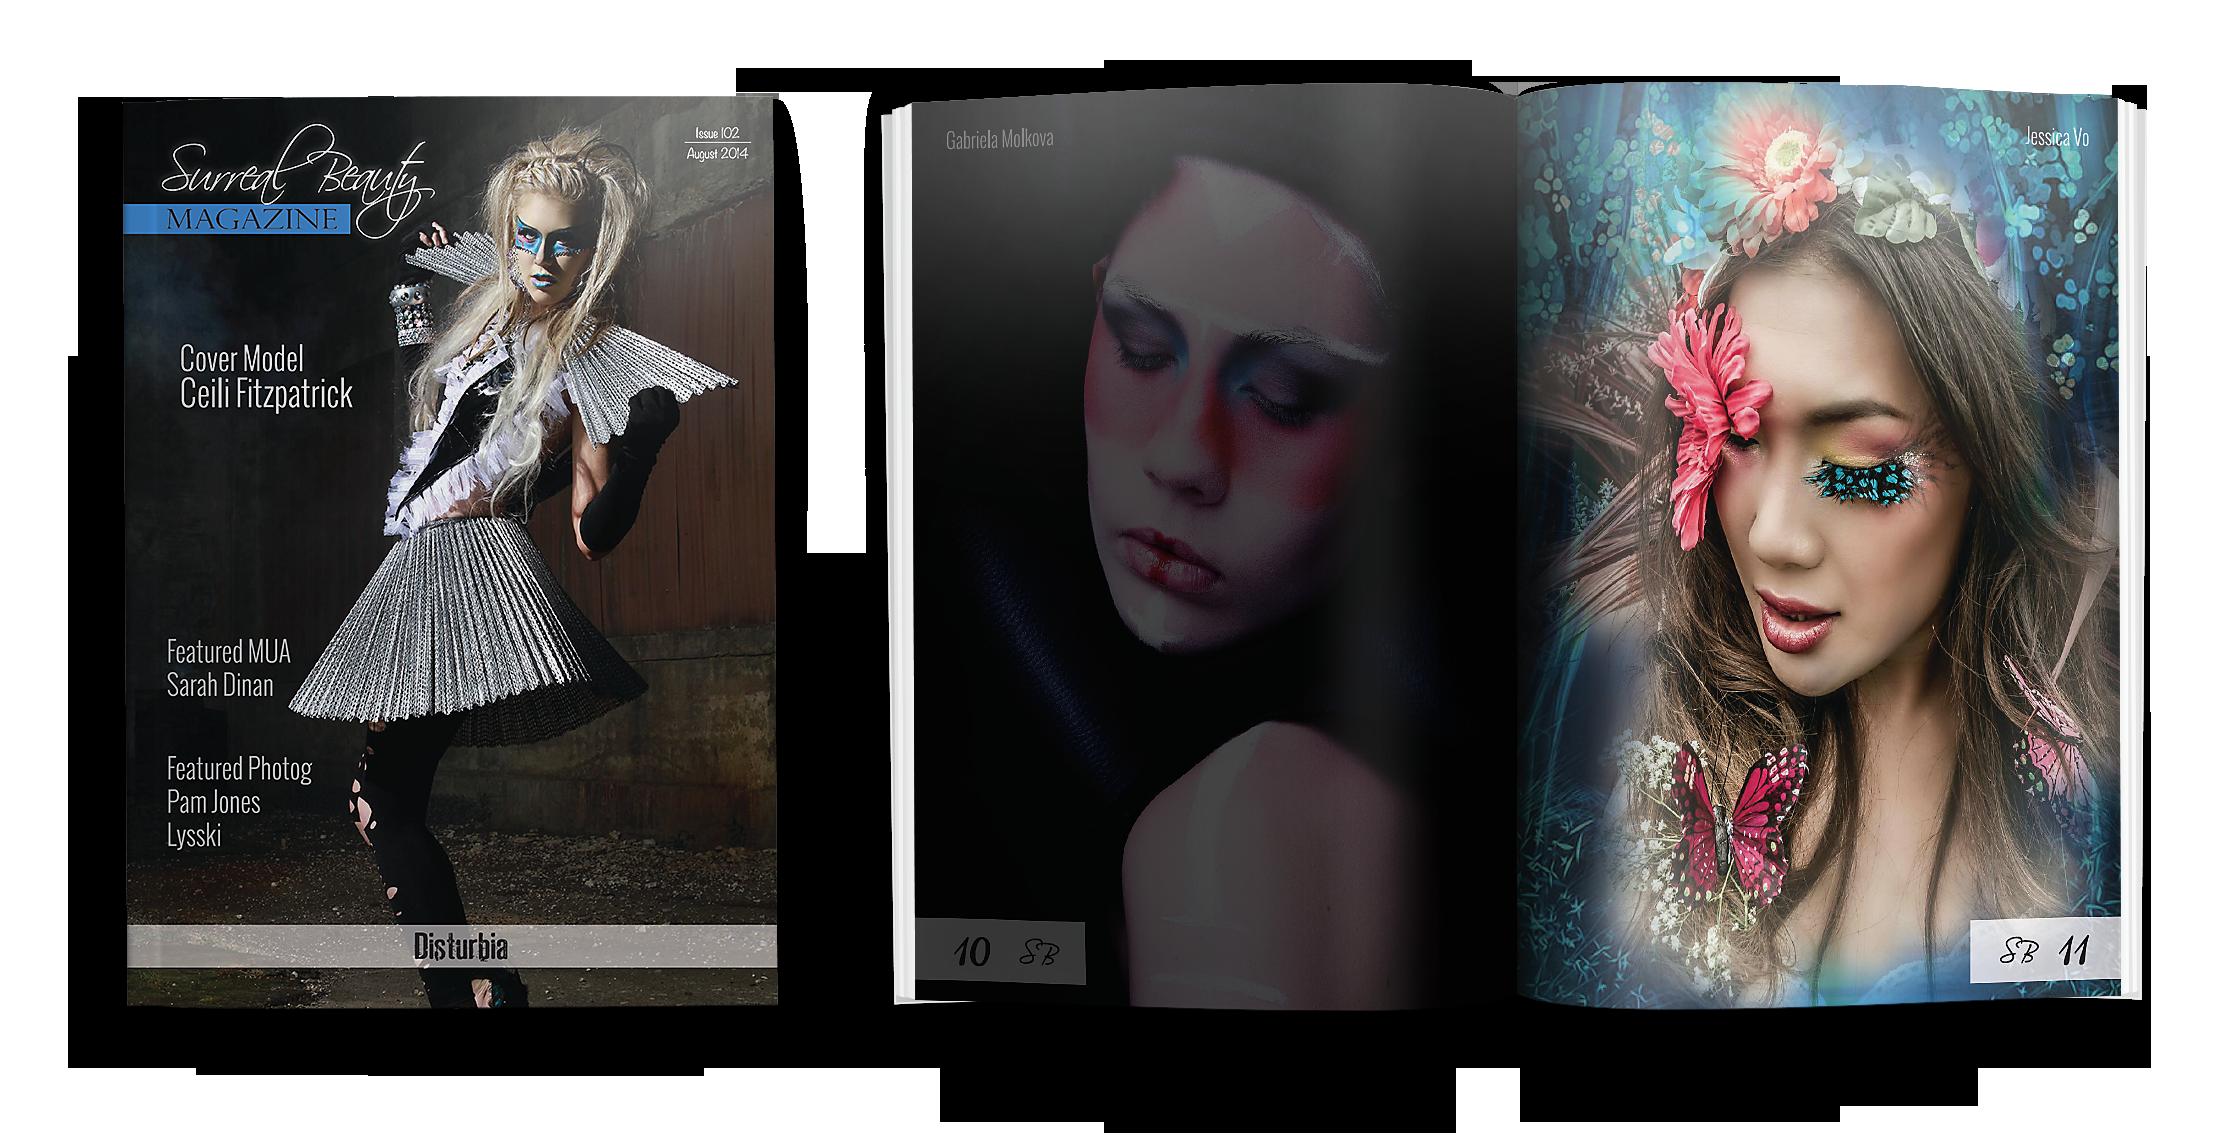 Surreal_Beauty_Magazine_Disturbia_Render1.png